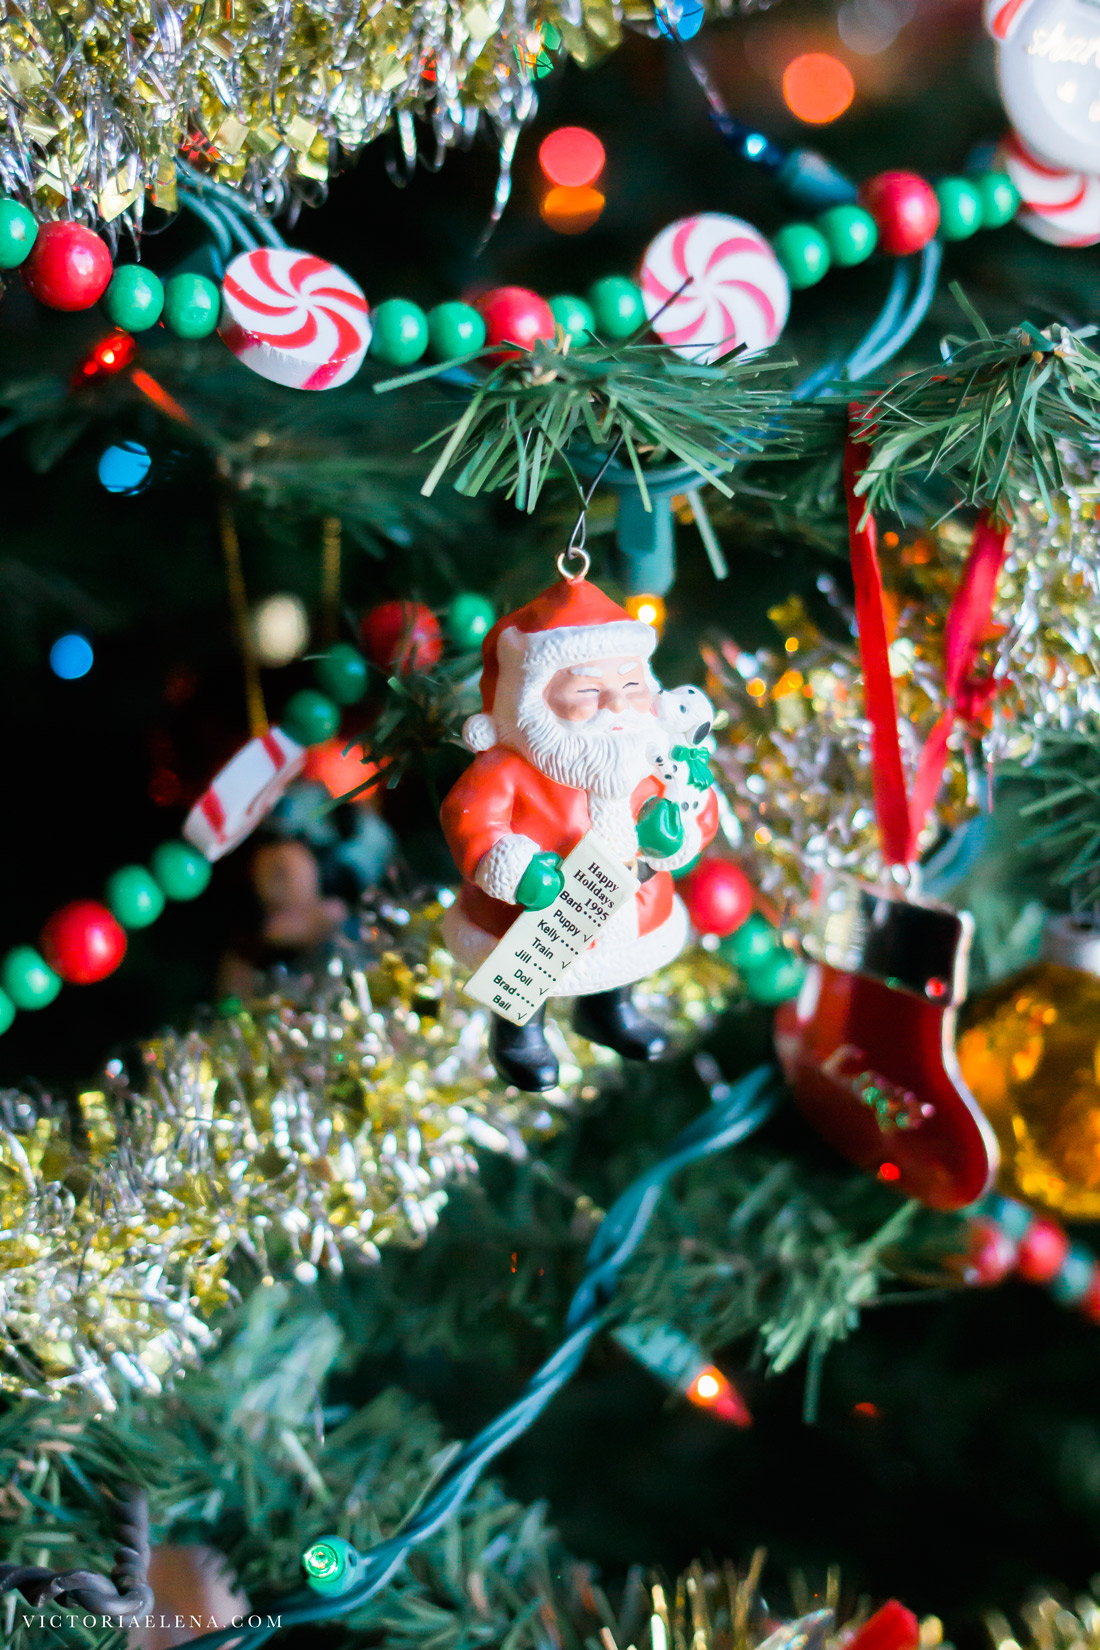 w-moms-christmas-ornaments-by-victoria-elena-8.jpg